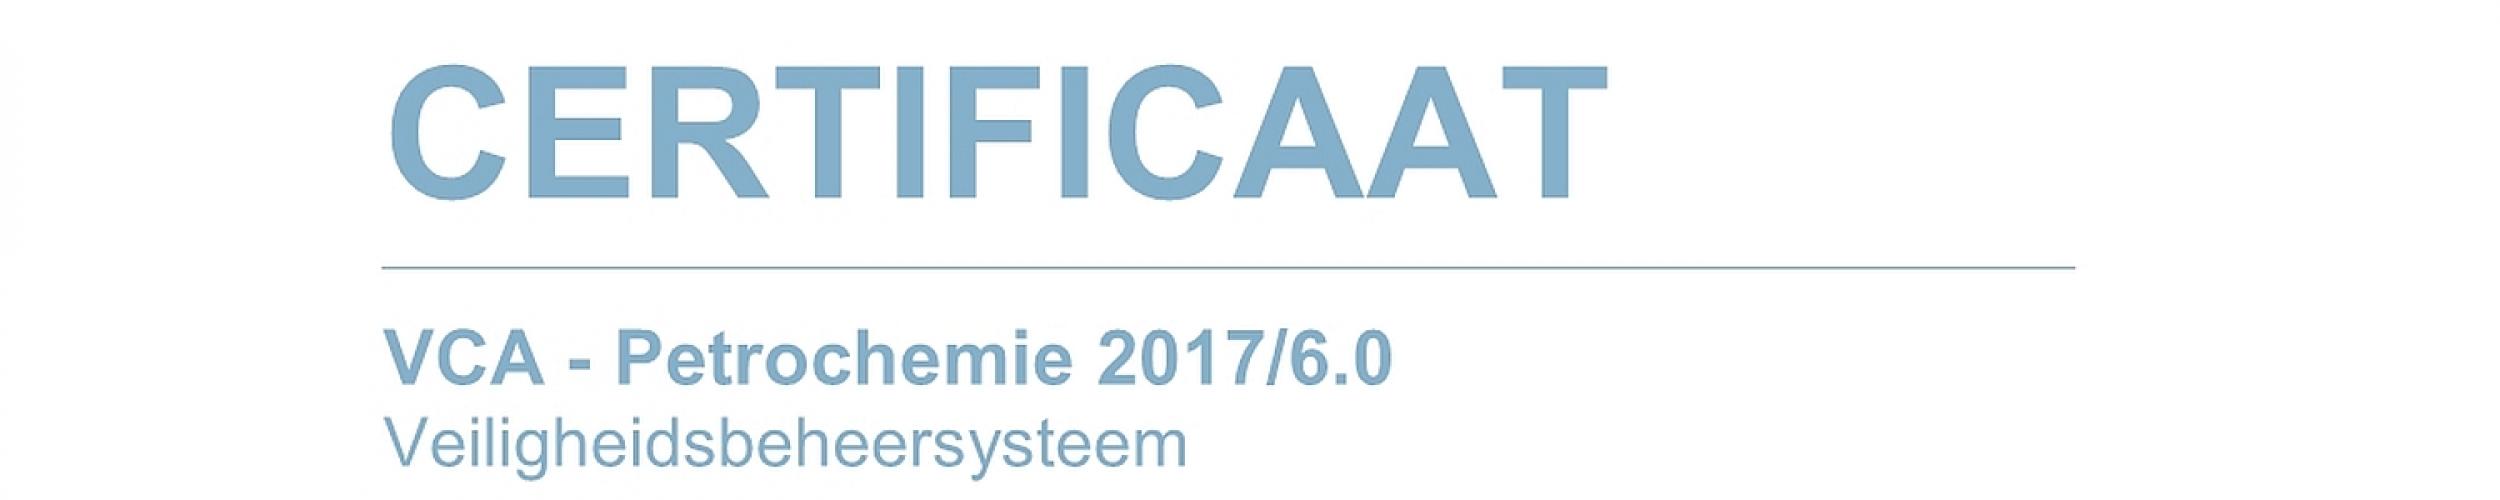 VCA P-hernieuwd!